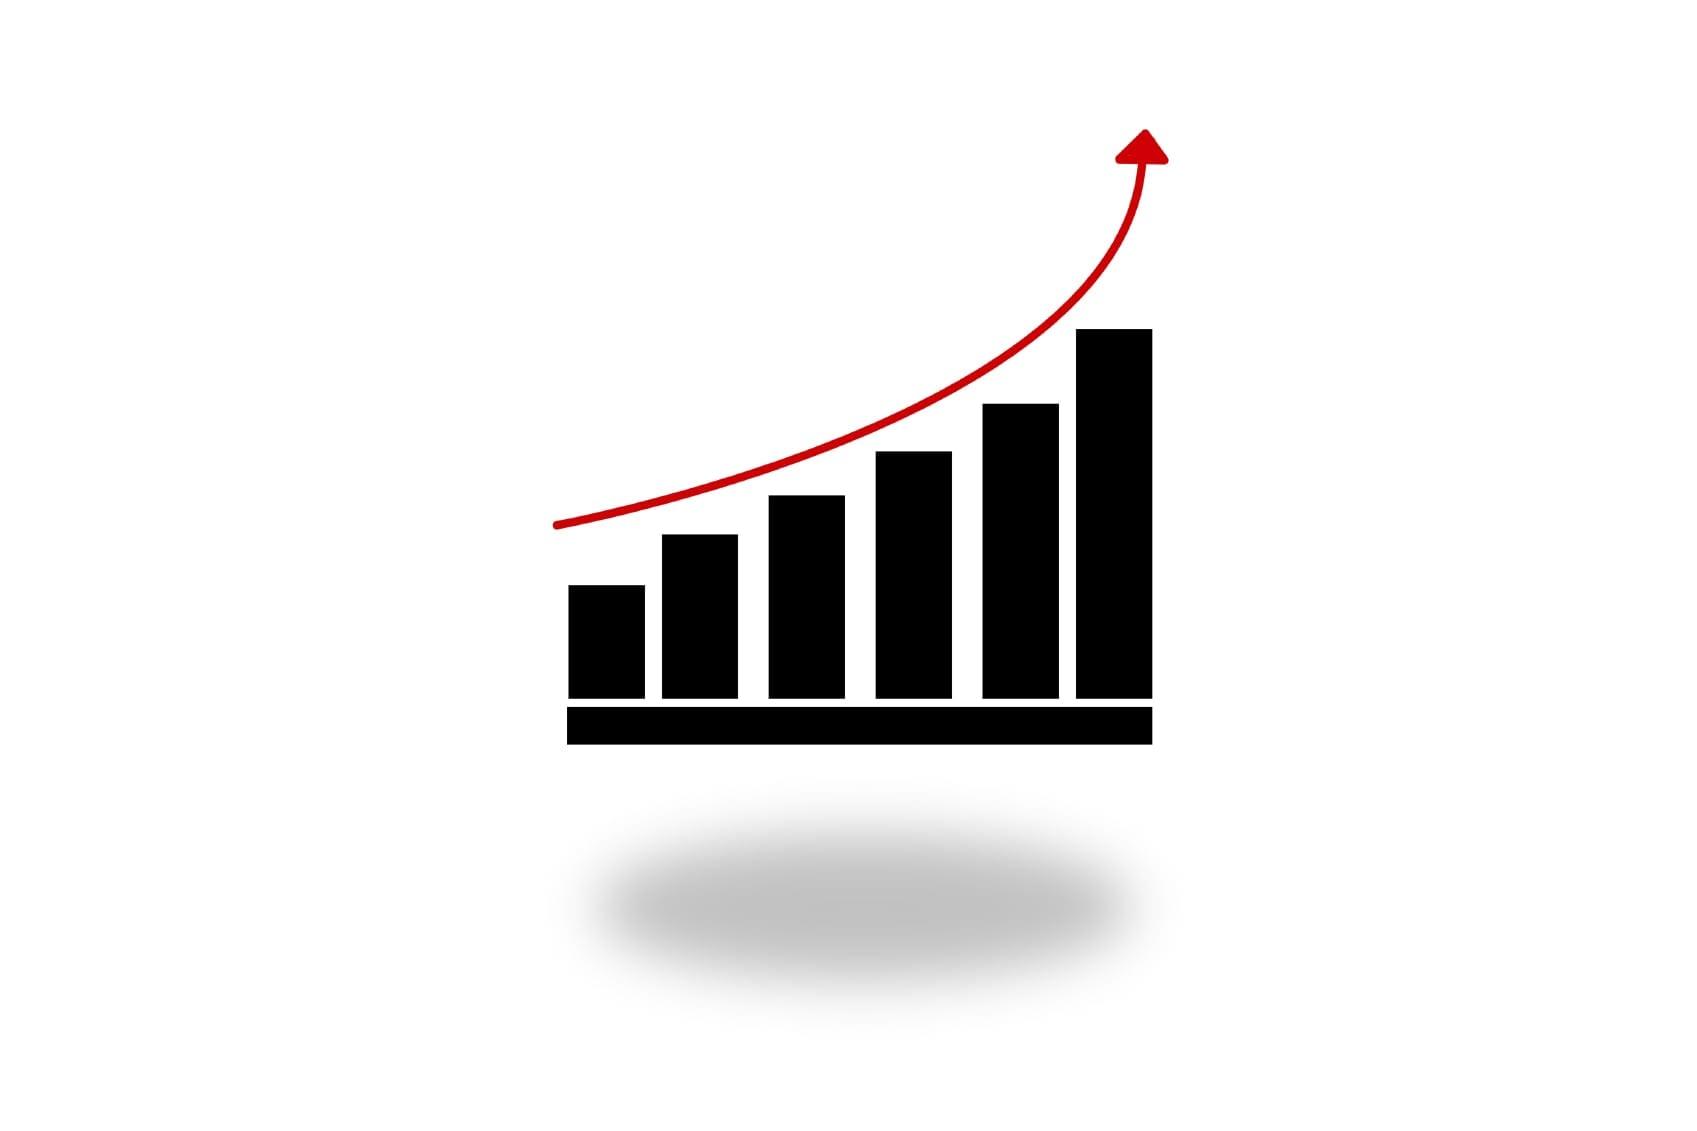 Chart Showing An Upward Trend